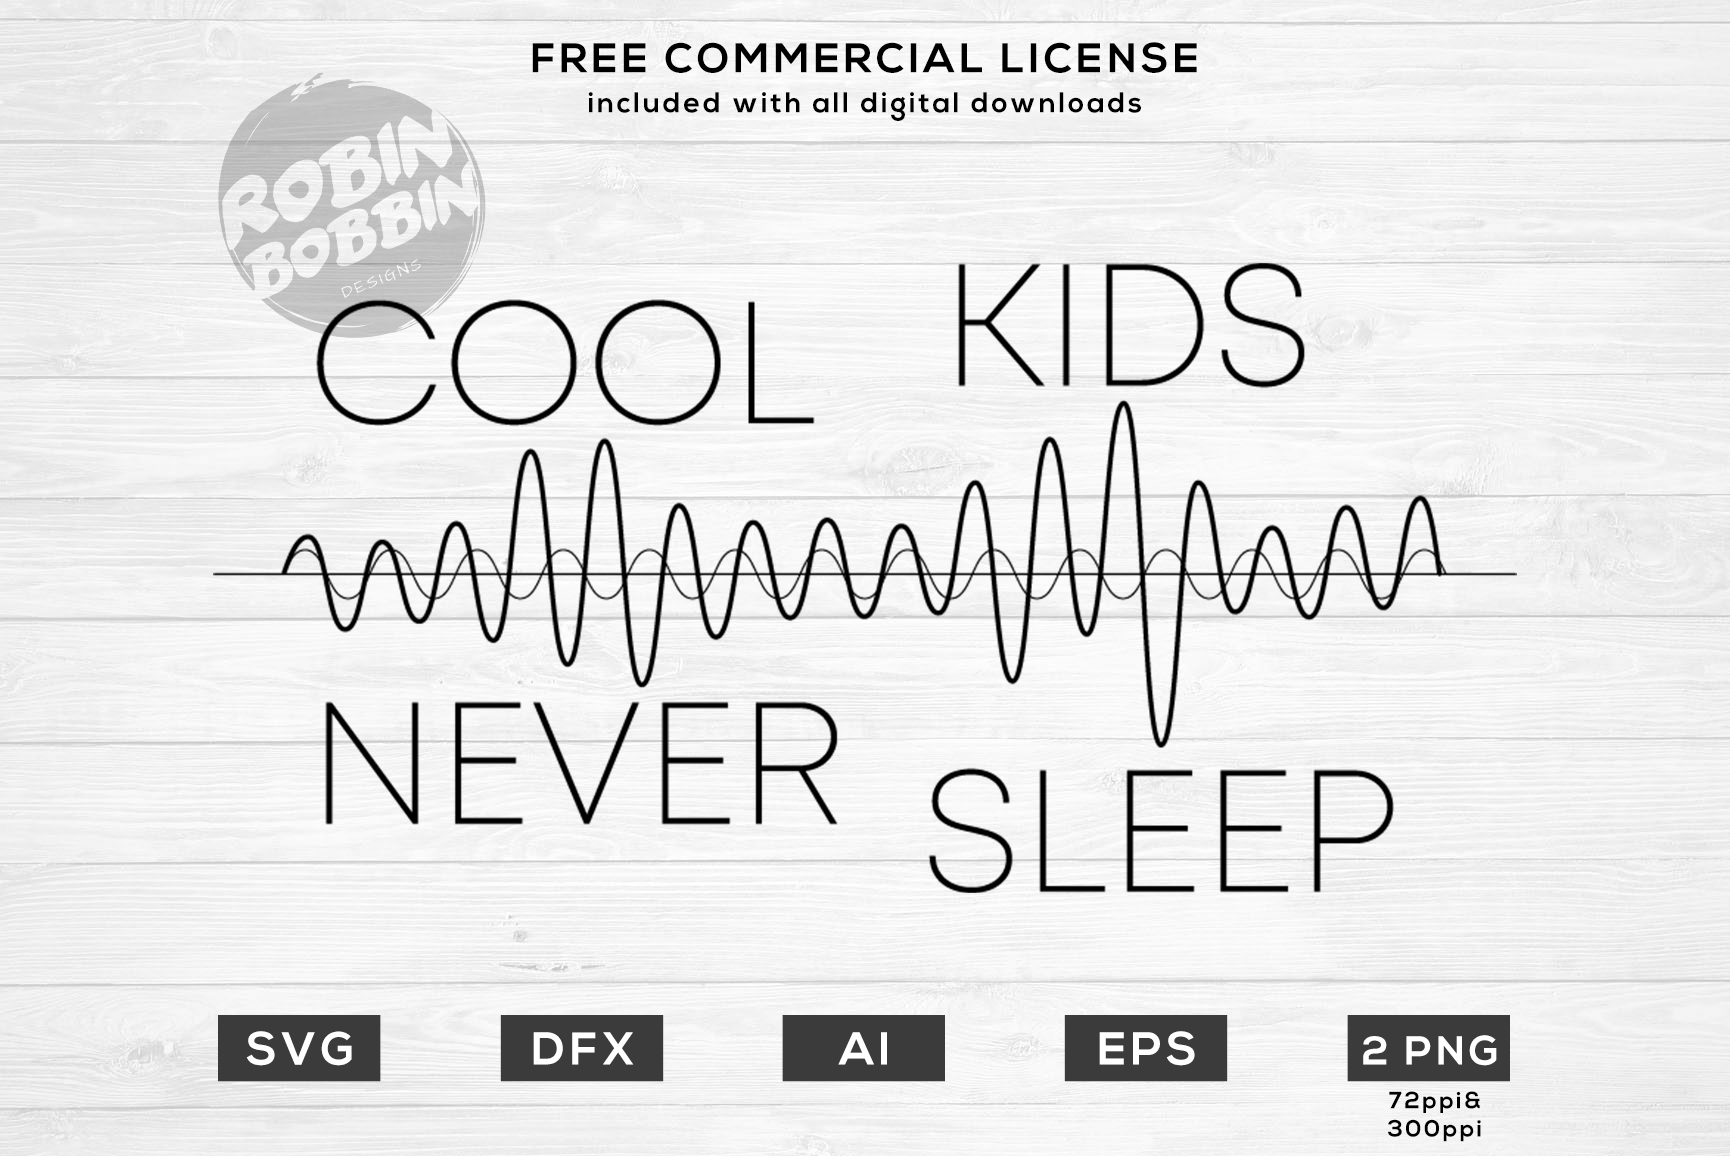 Cool Kids Never Sleep Design for T-Shirt, Hoodies, Mugs example image 1